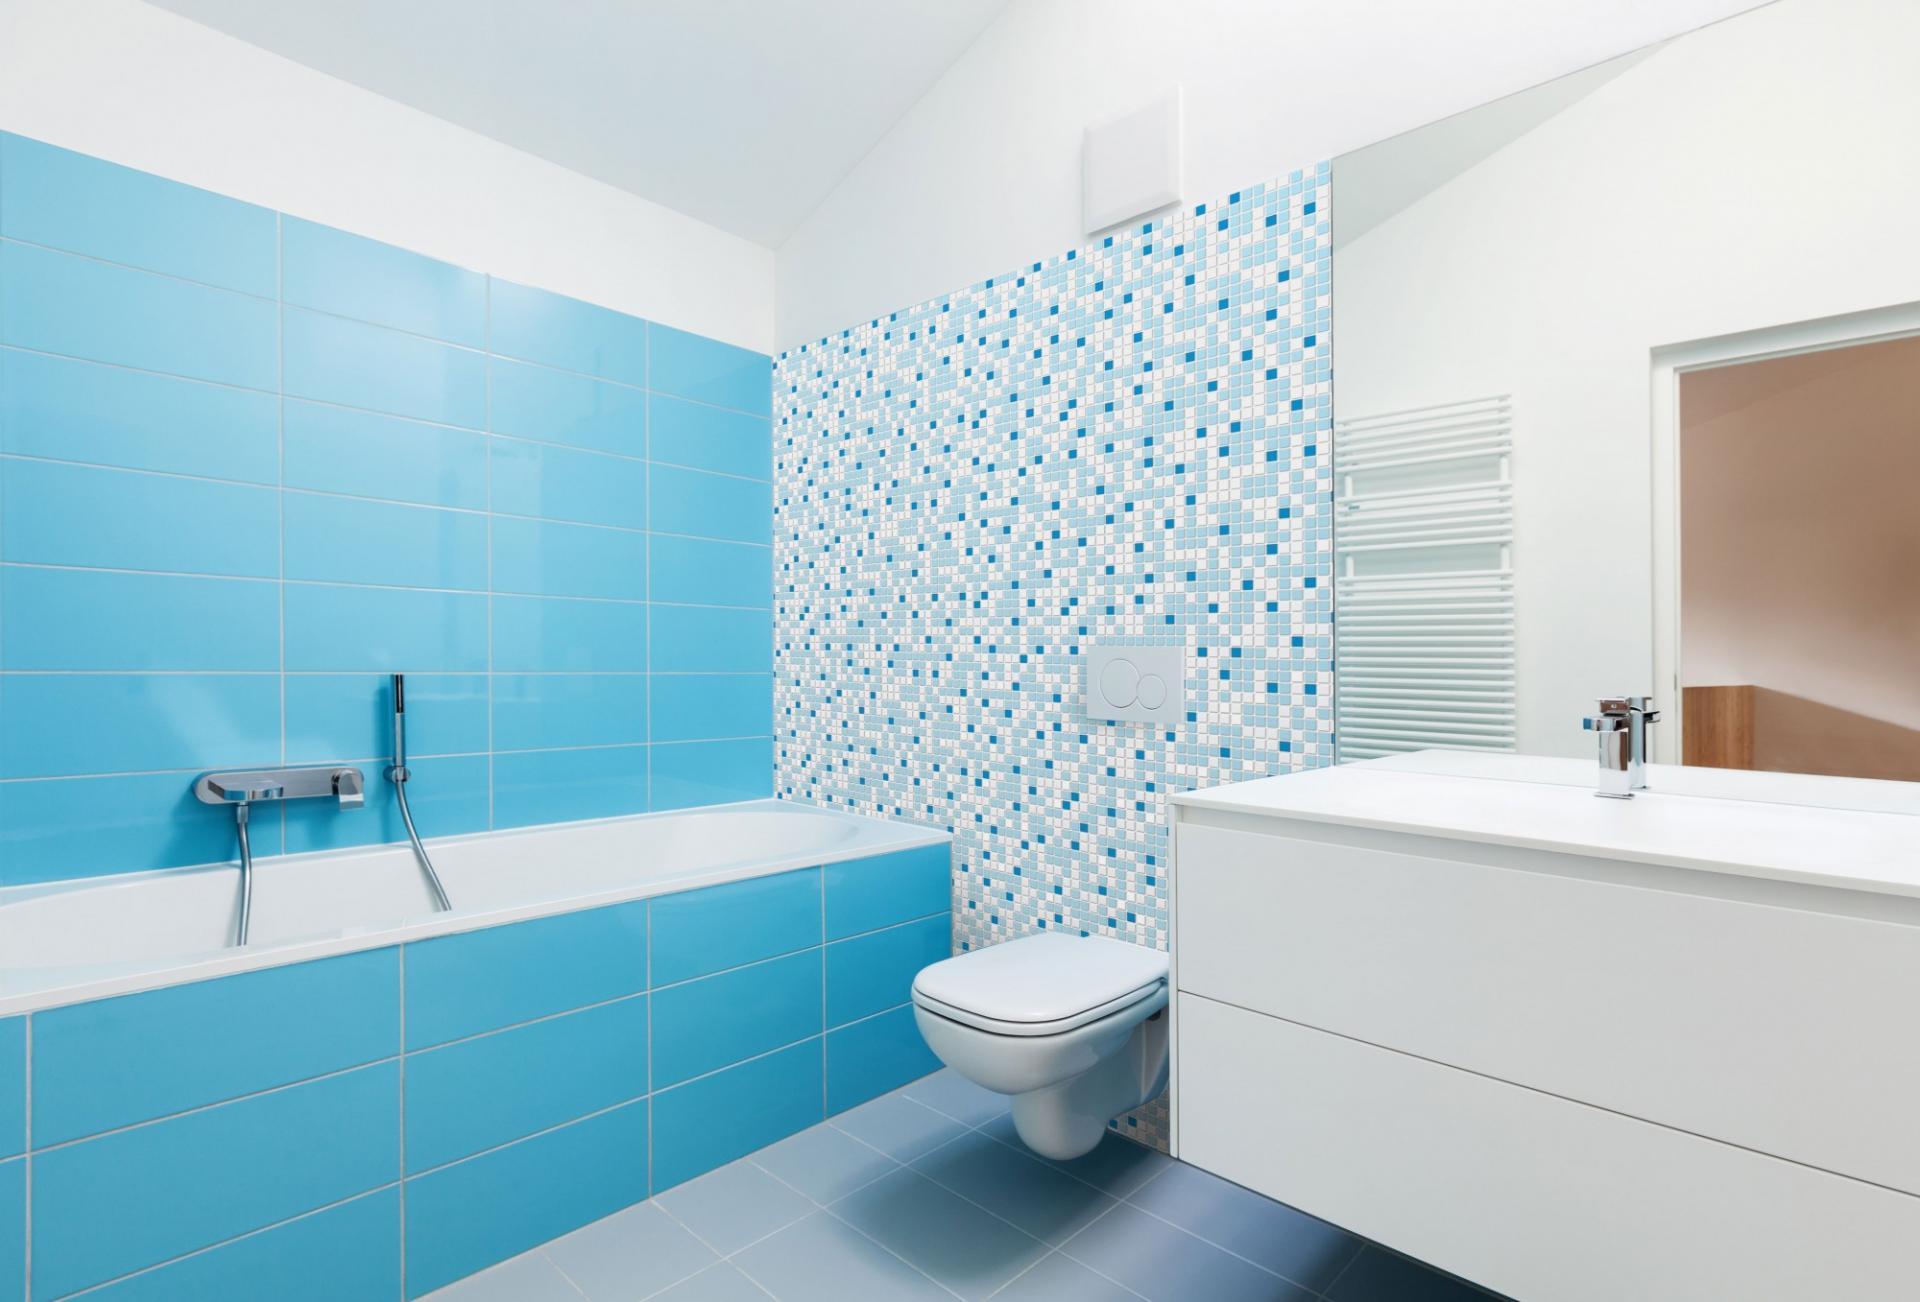 Mosaic dark blue 3